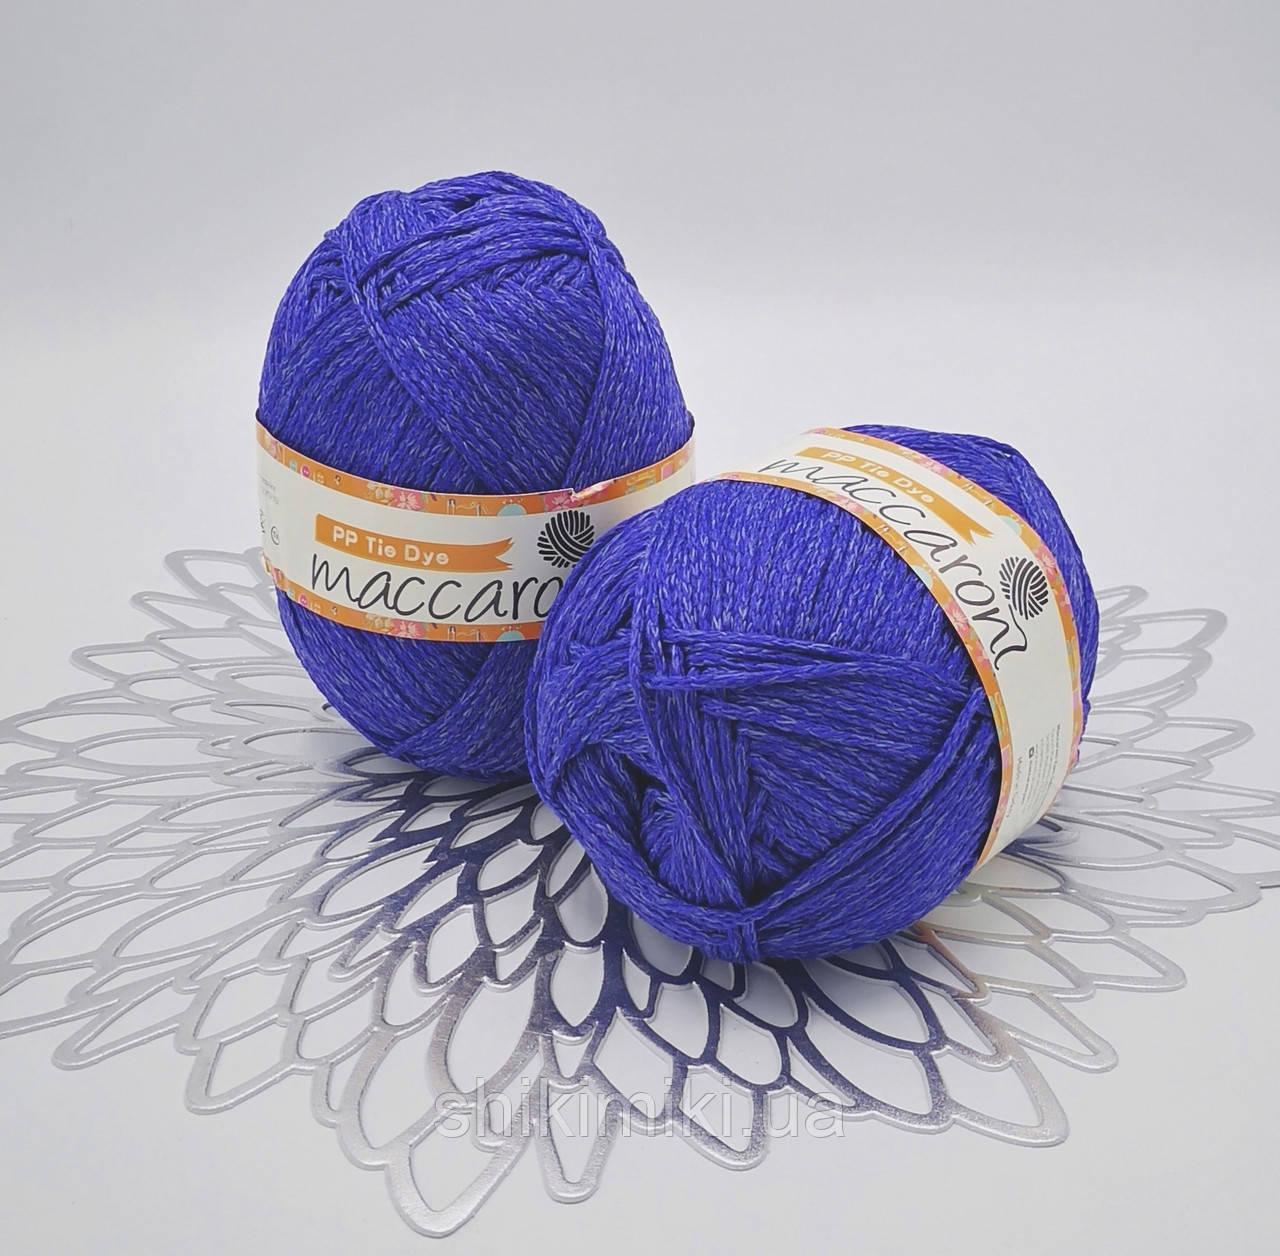 Трикотажный шнур PP Tie Dye, цвет Блуберри